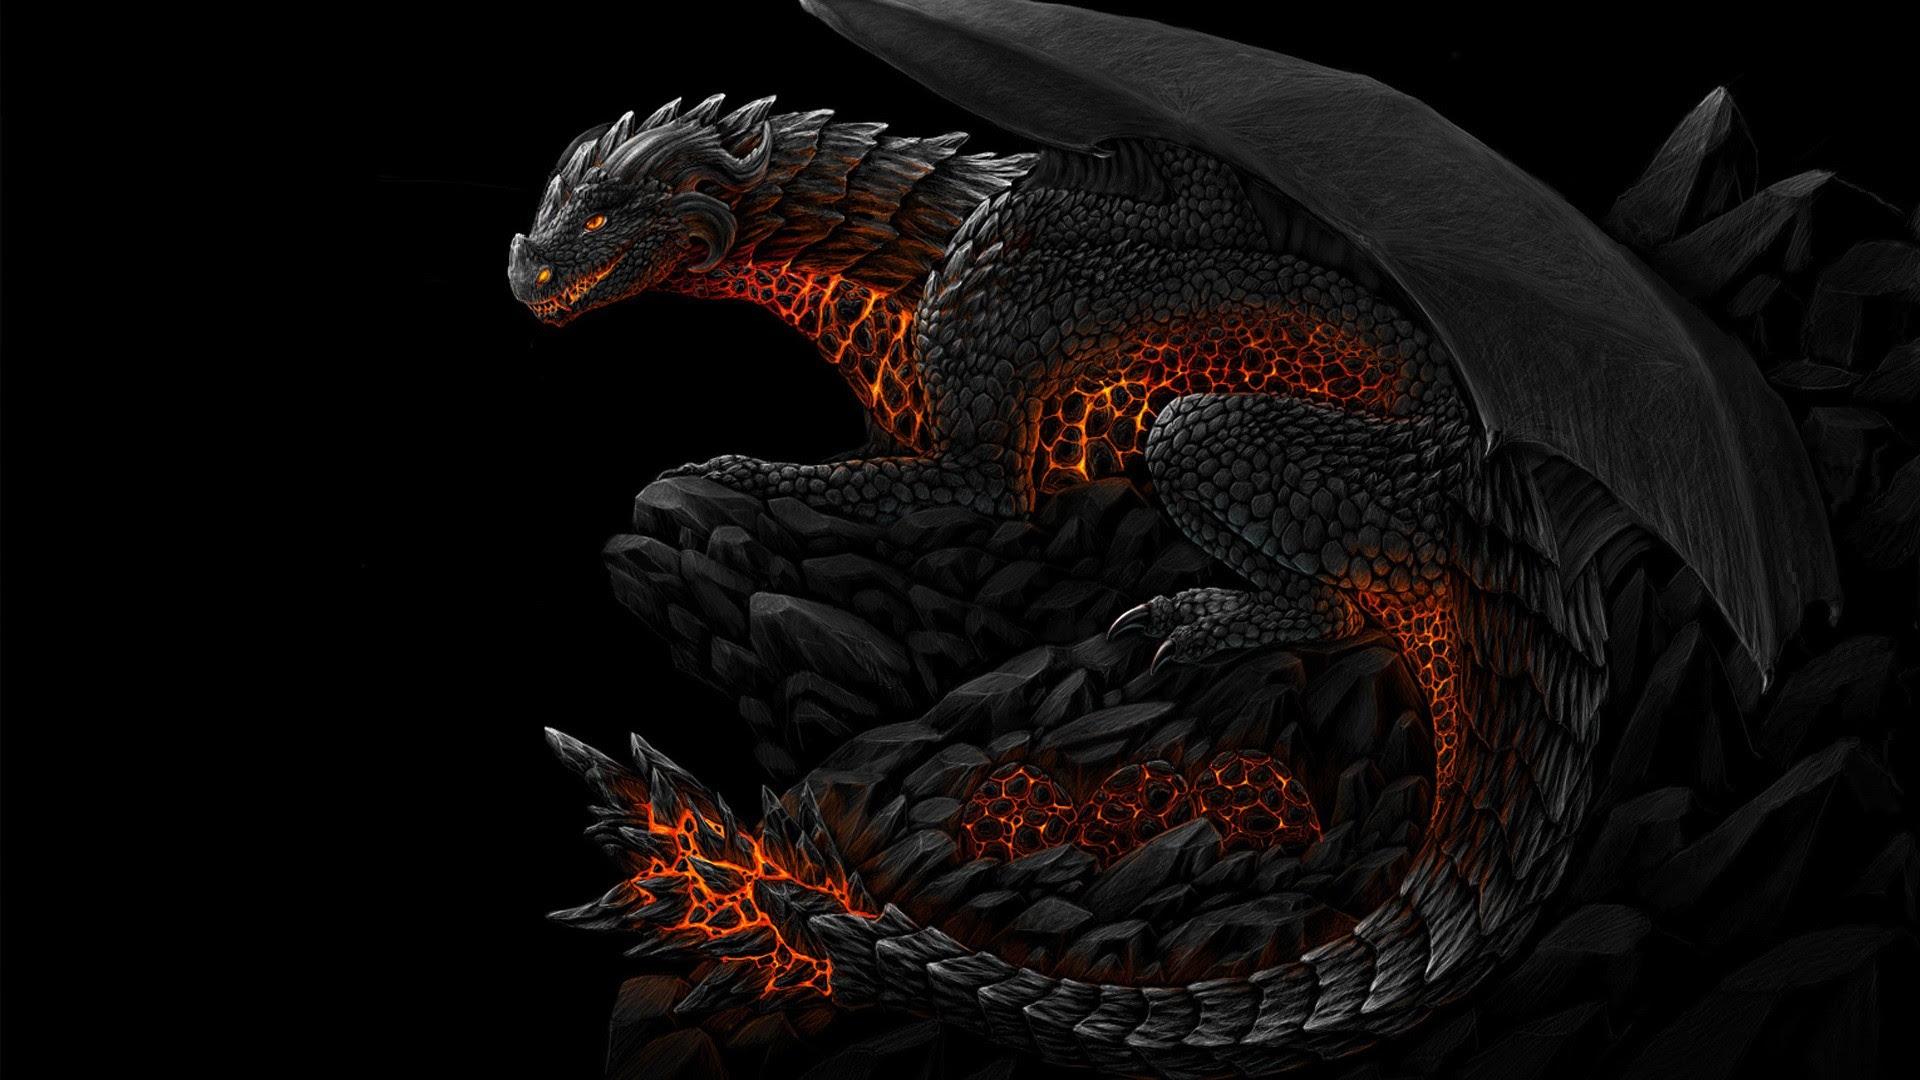 8000 Wallpaper Android Dragon HD